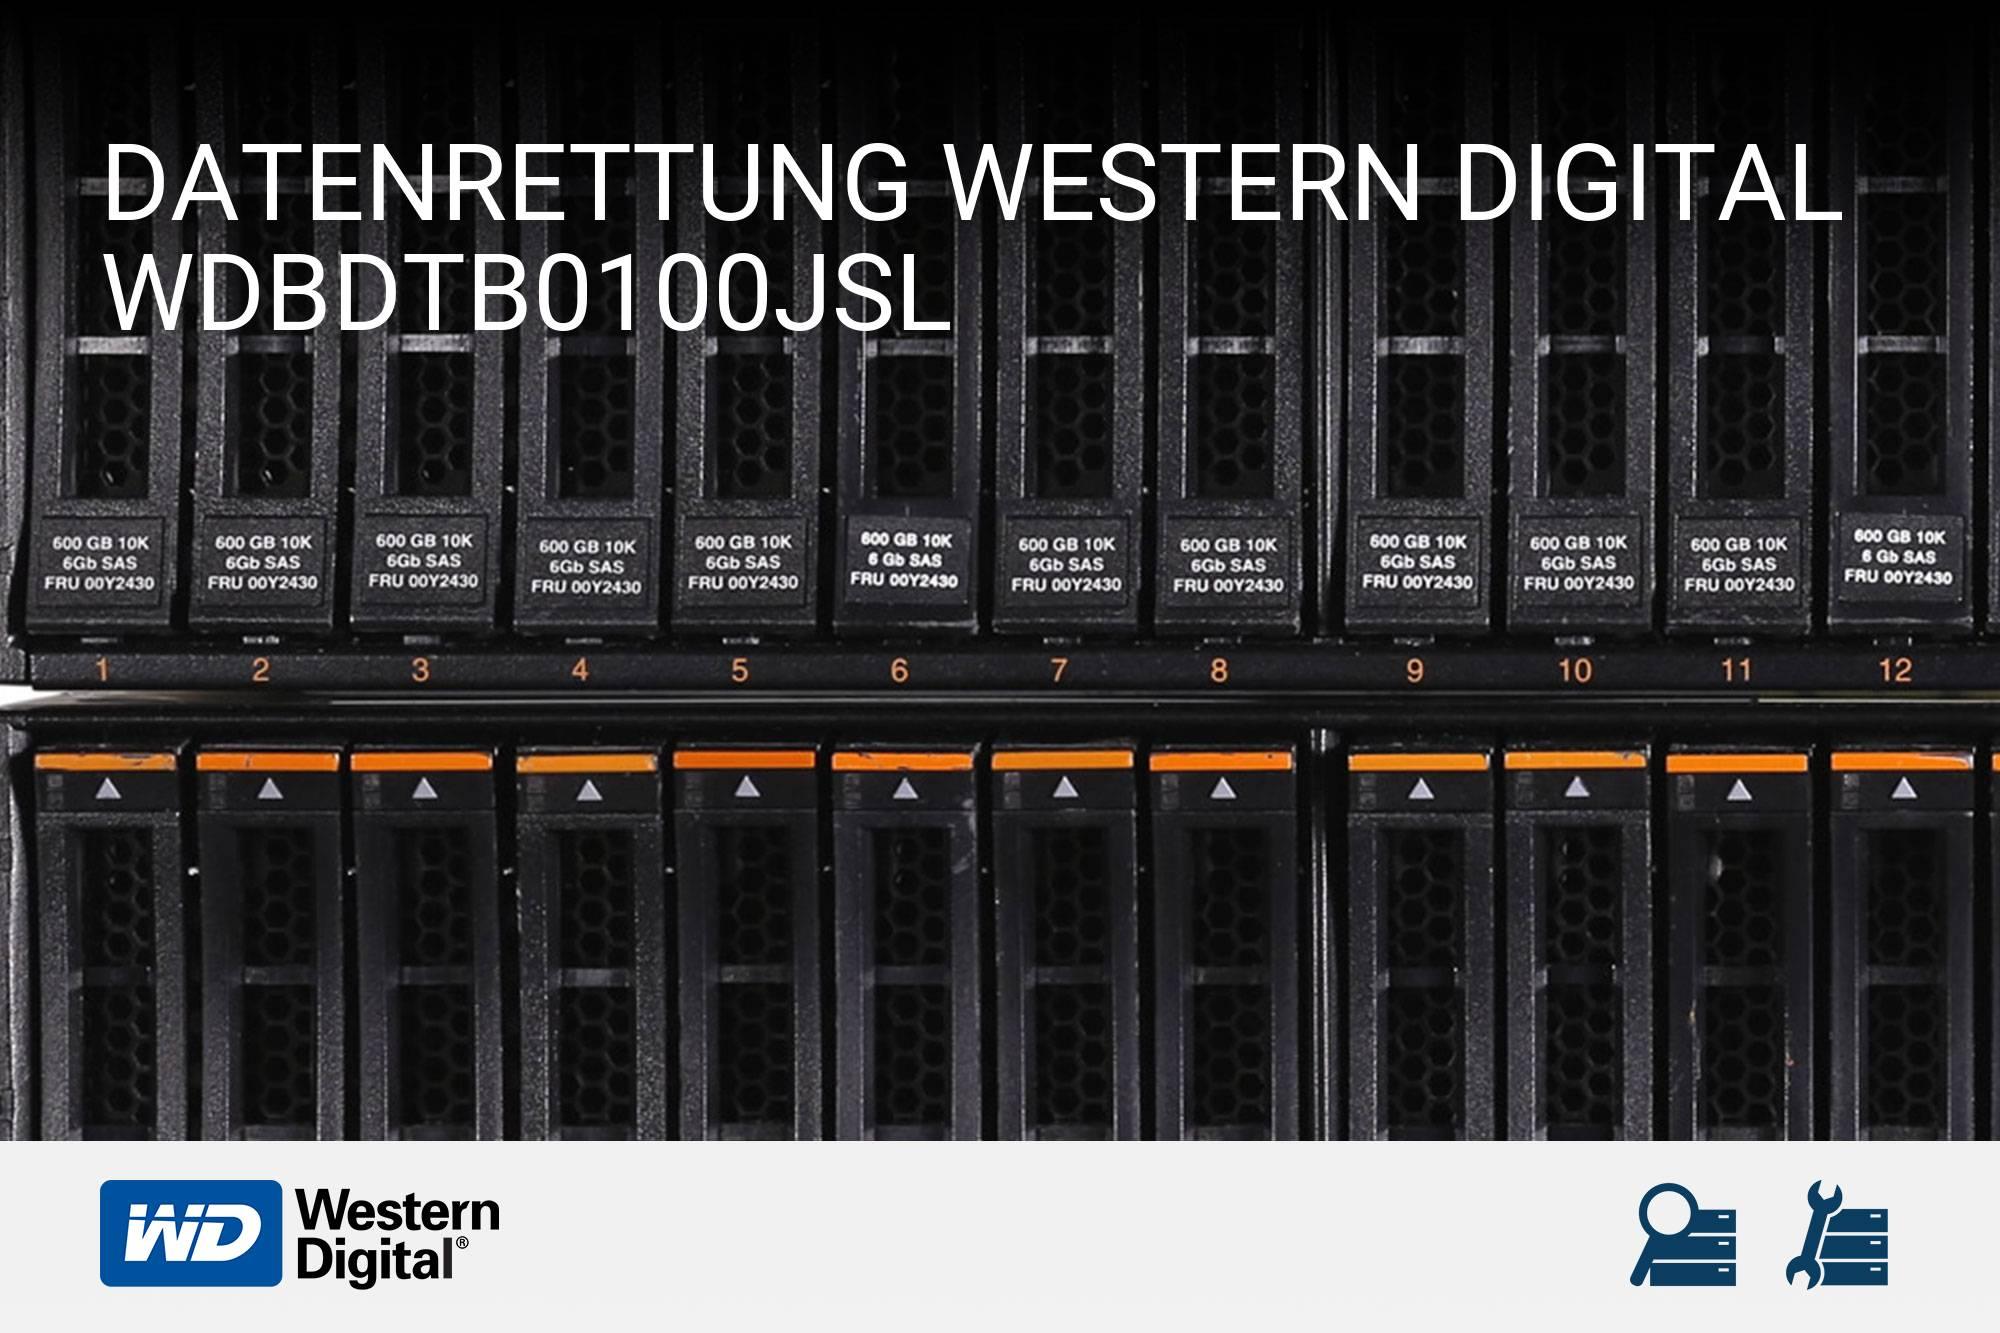 Western Digital WDBDTB0100JSL